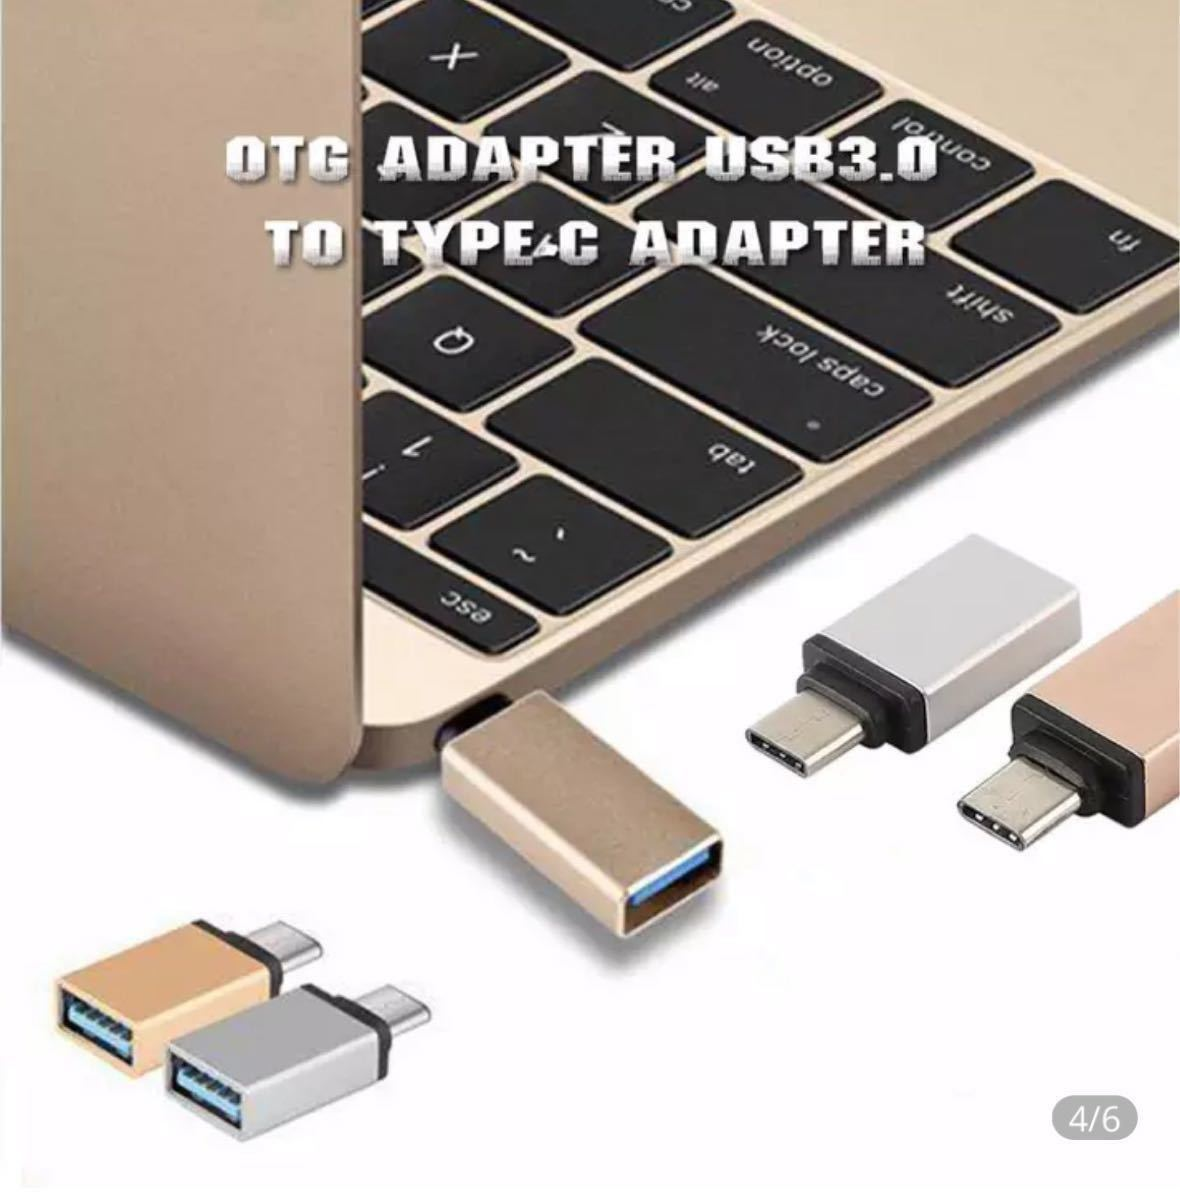 USB3.0 タイプC 変換アダプター オスメス3個セット!